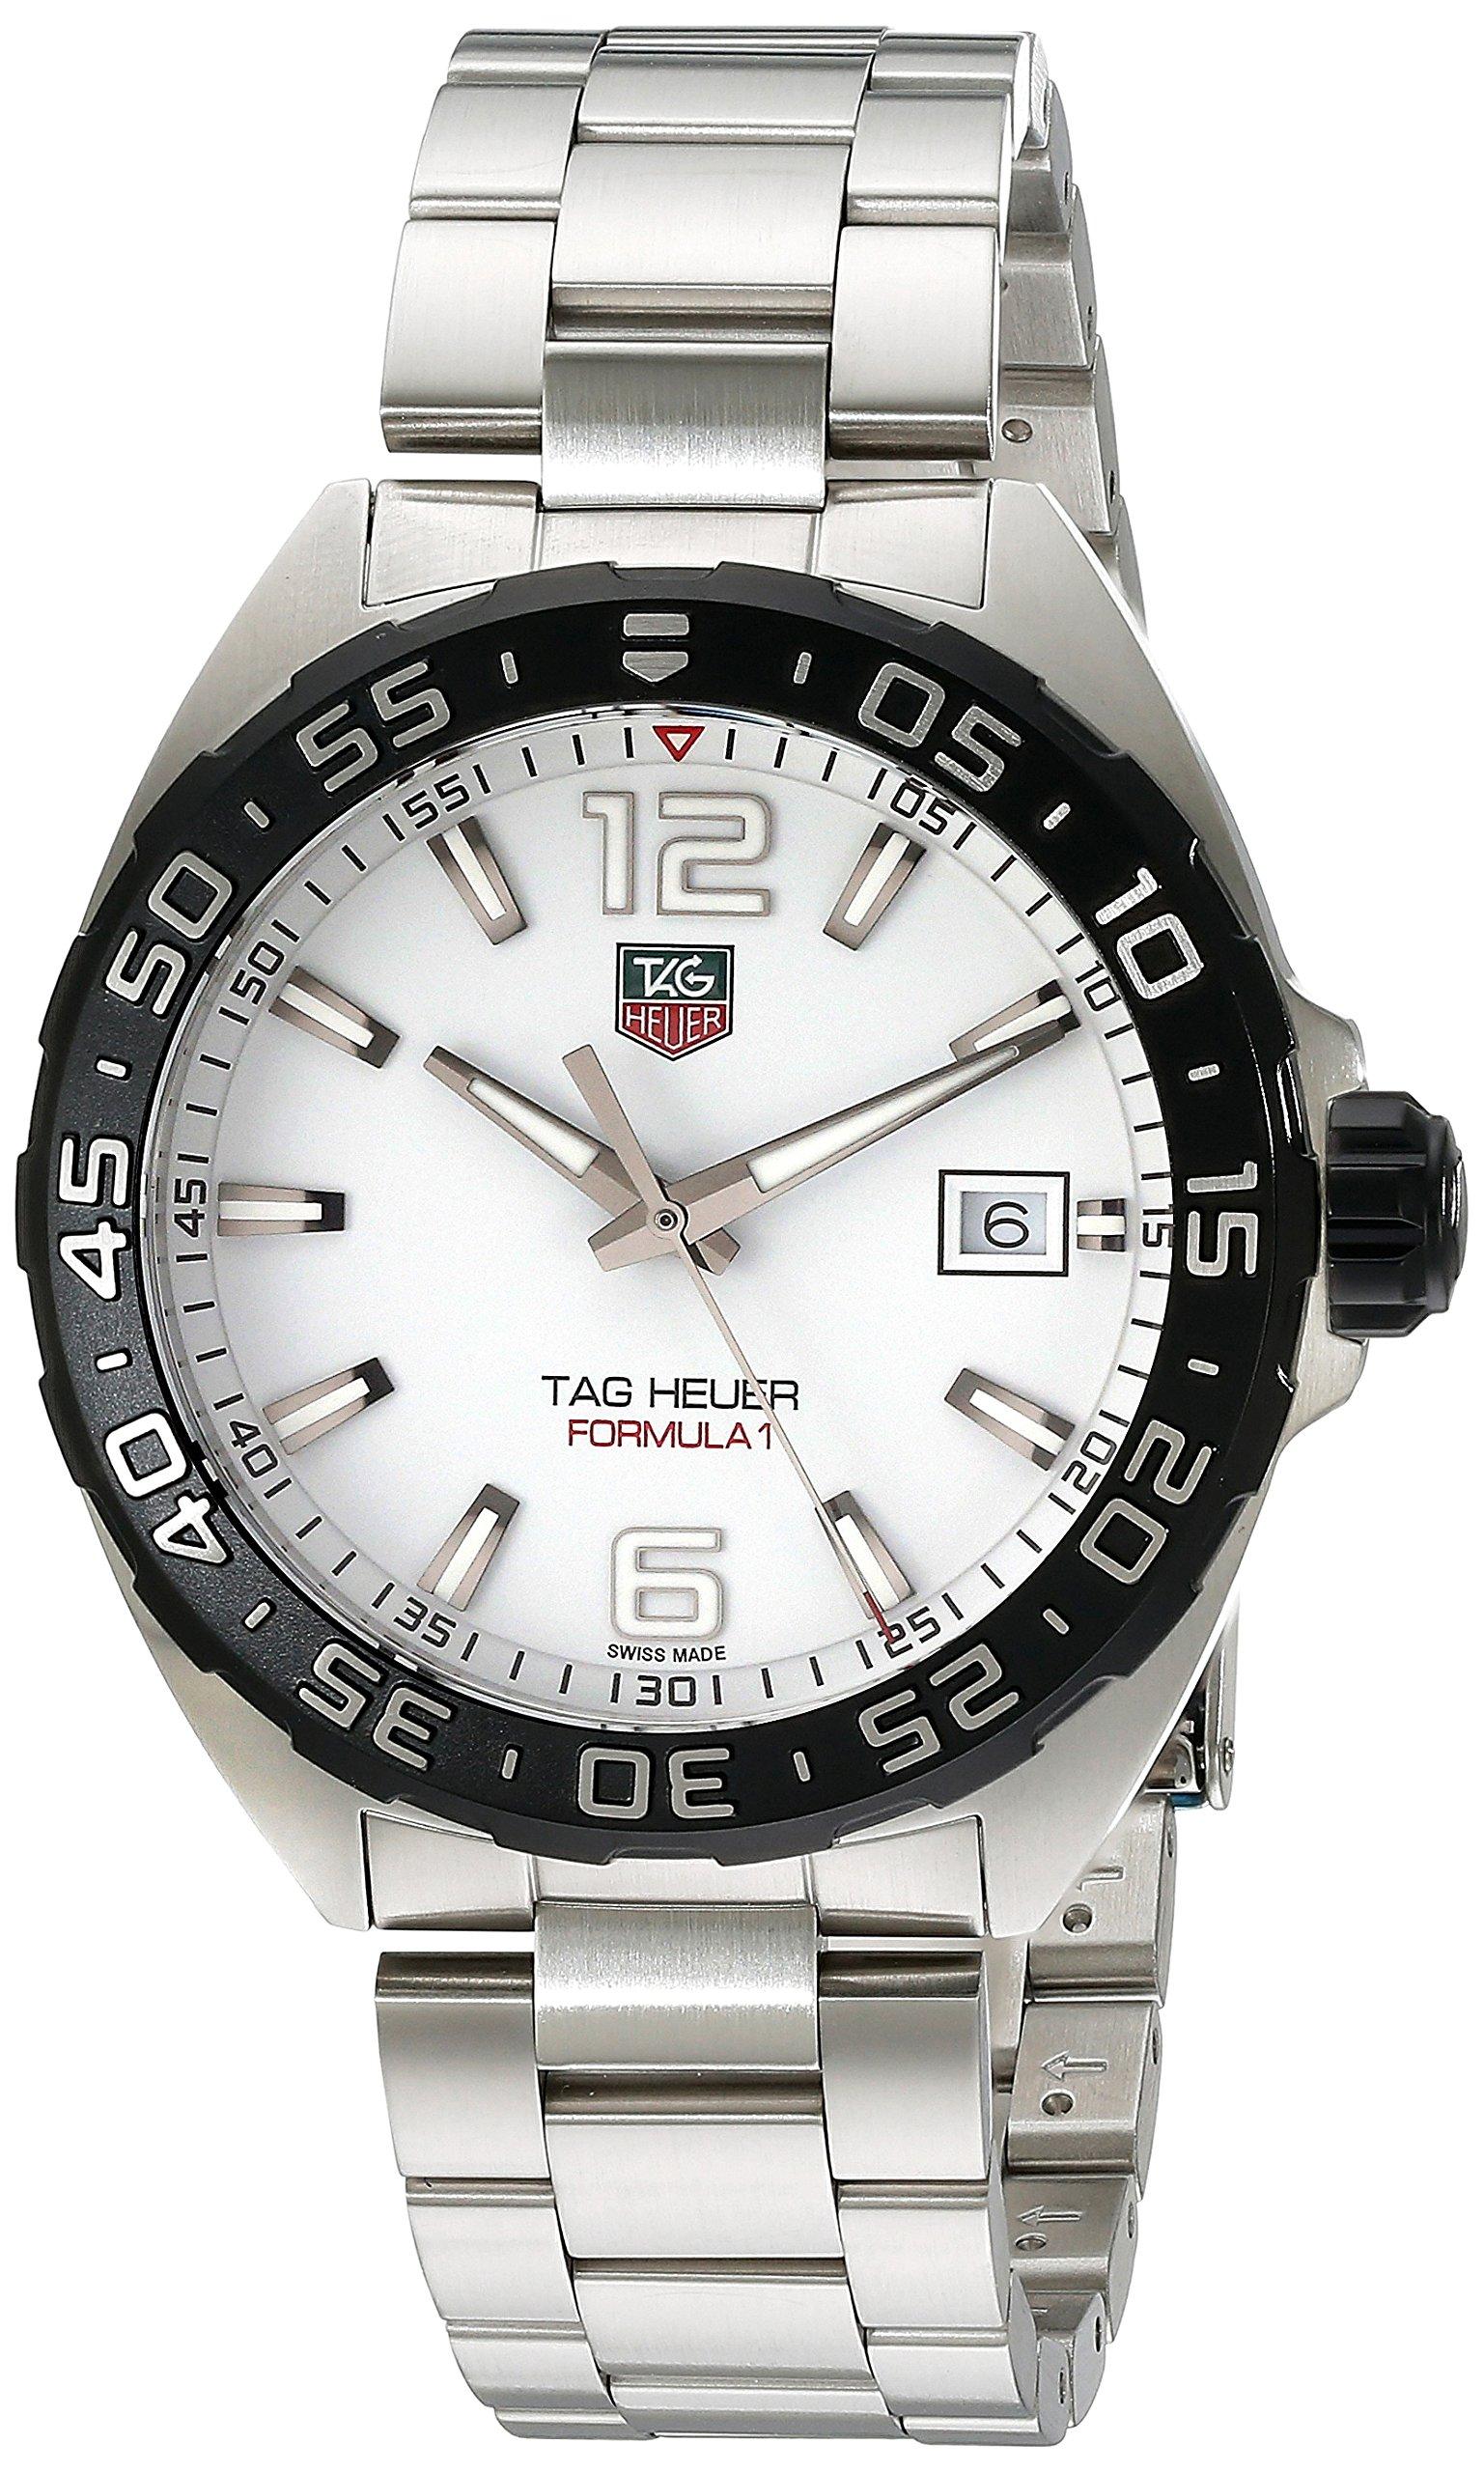 TAG-Heuer-Formula-1-Reloj-Reloj-de-pulsera-Masculino-Acero-Acero-pulido-Acero-Acero-inoxidable